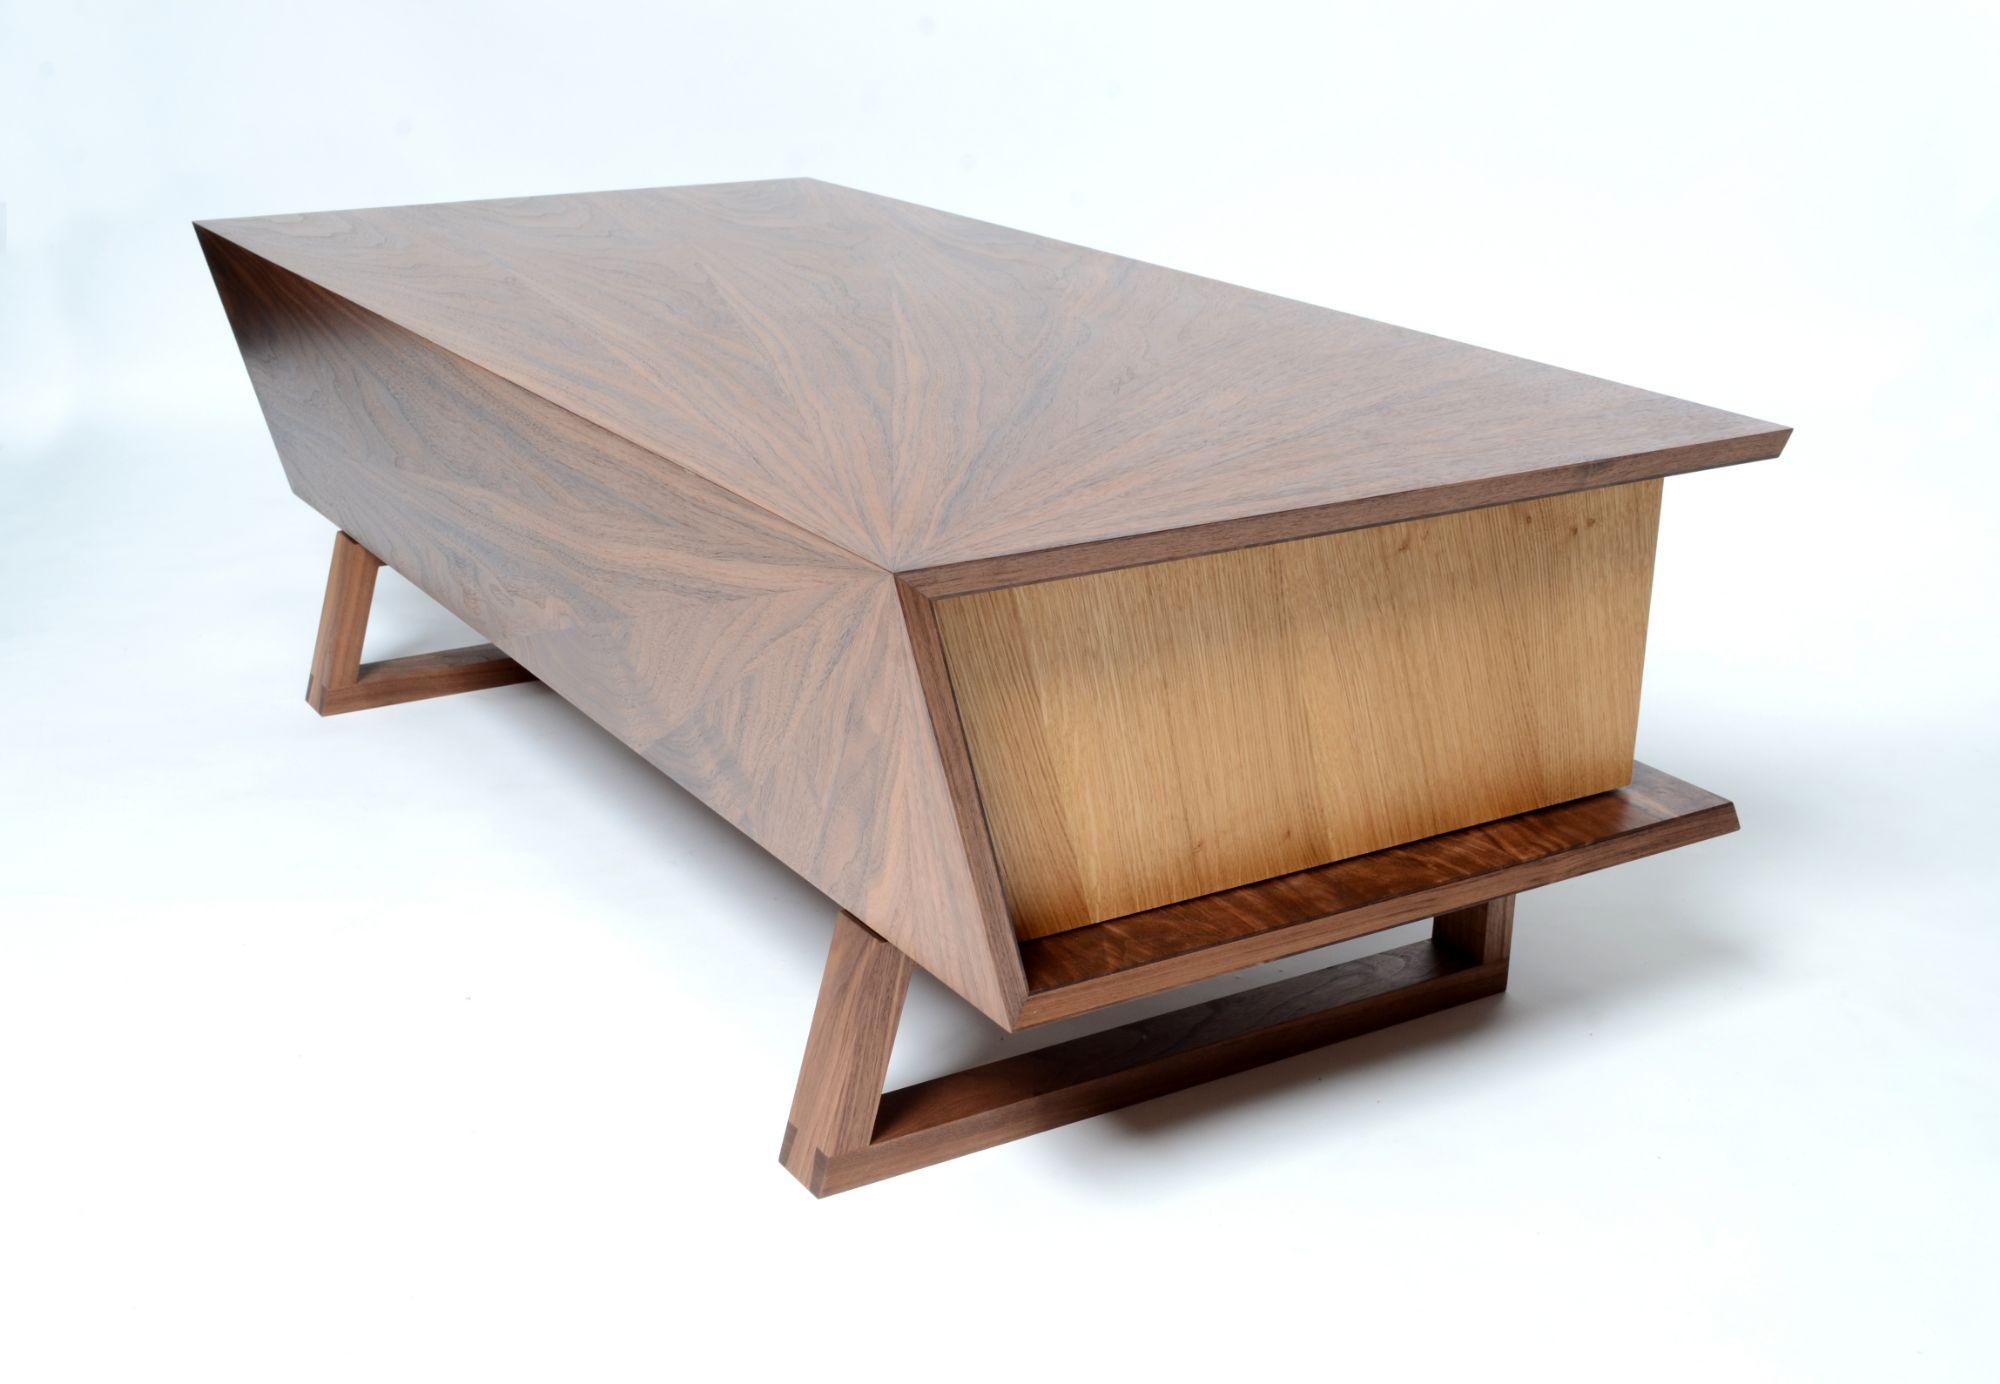 Coffee table in walnut and oak